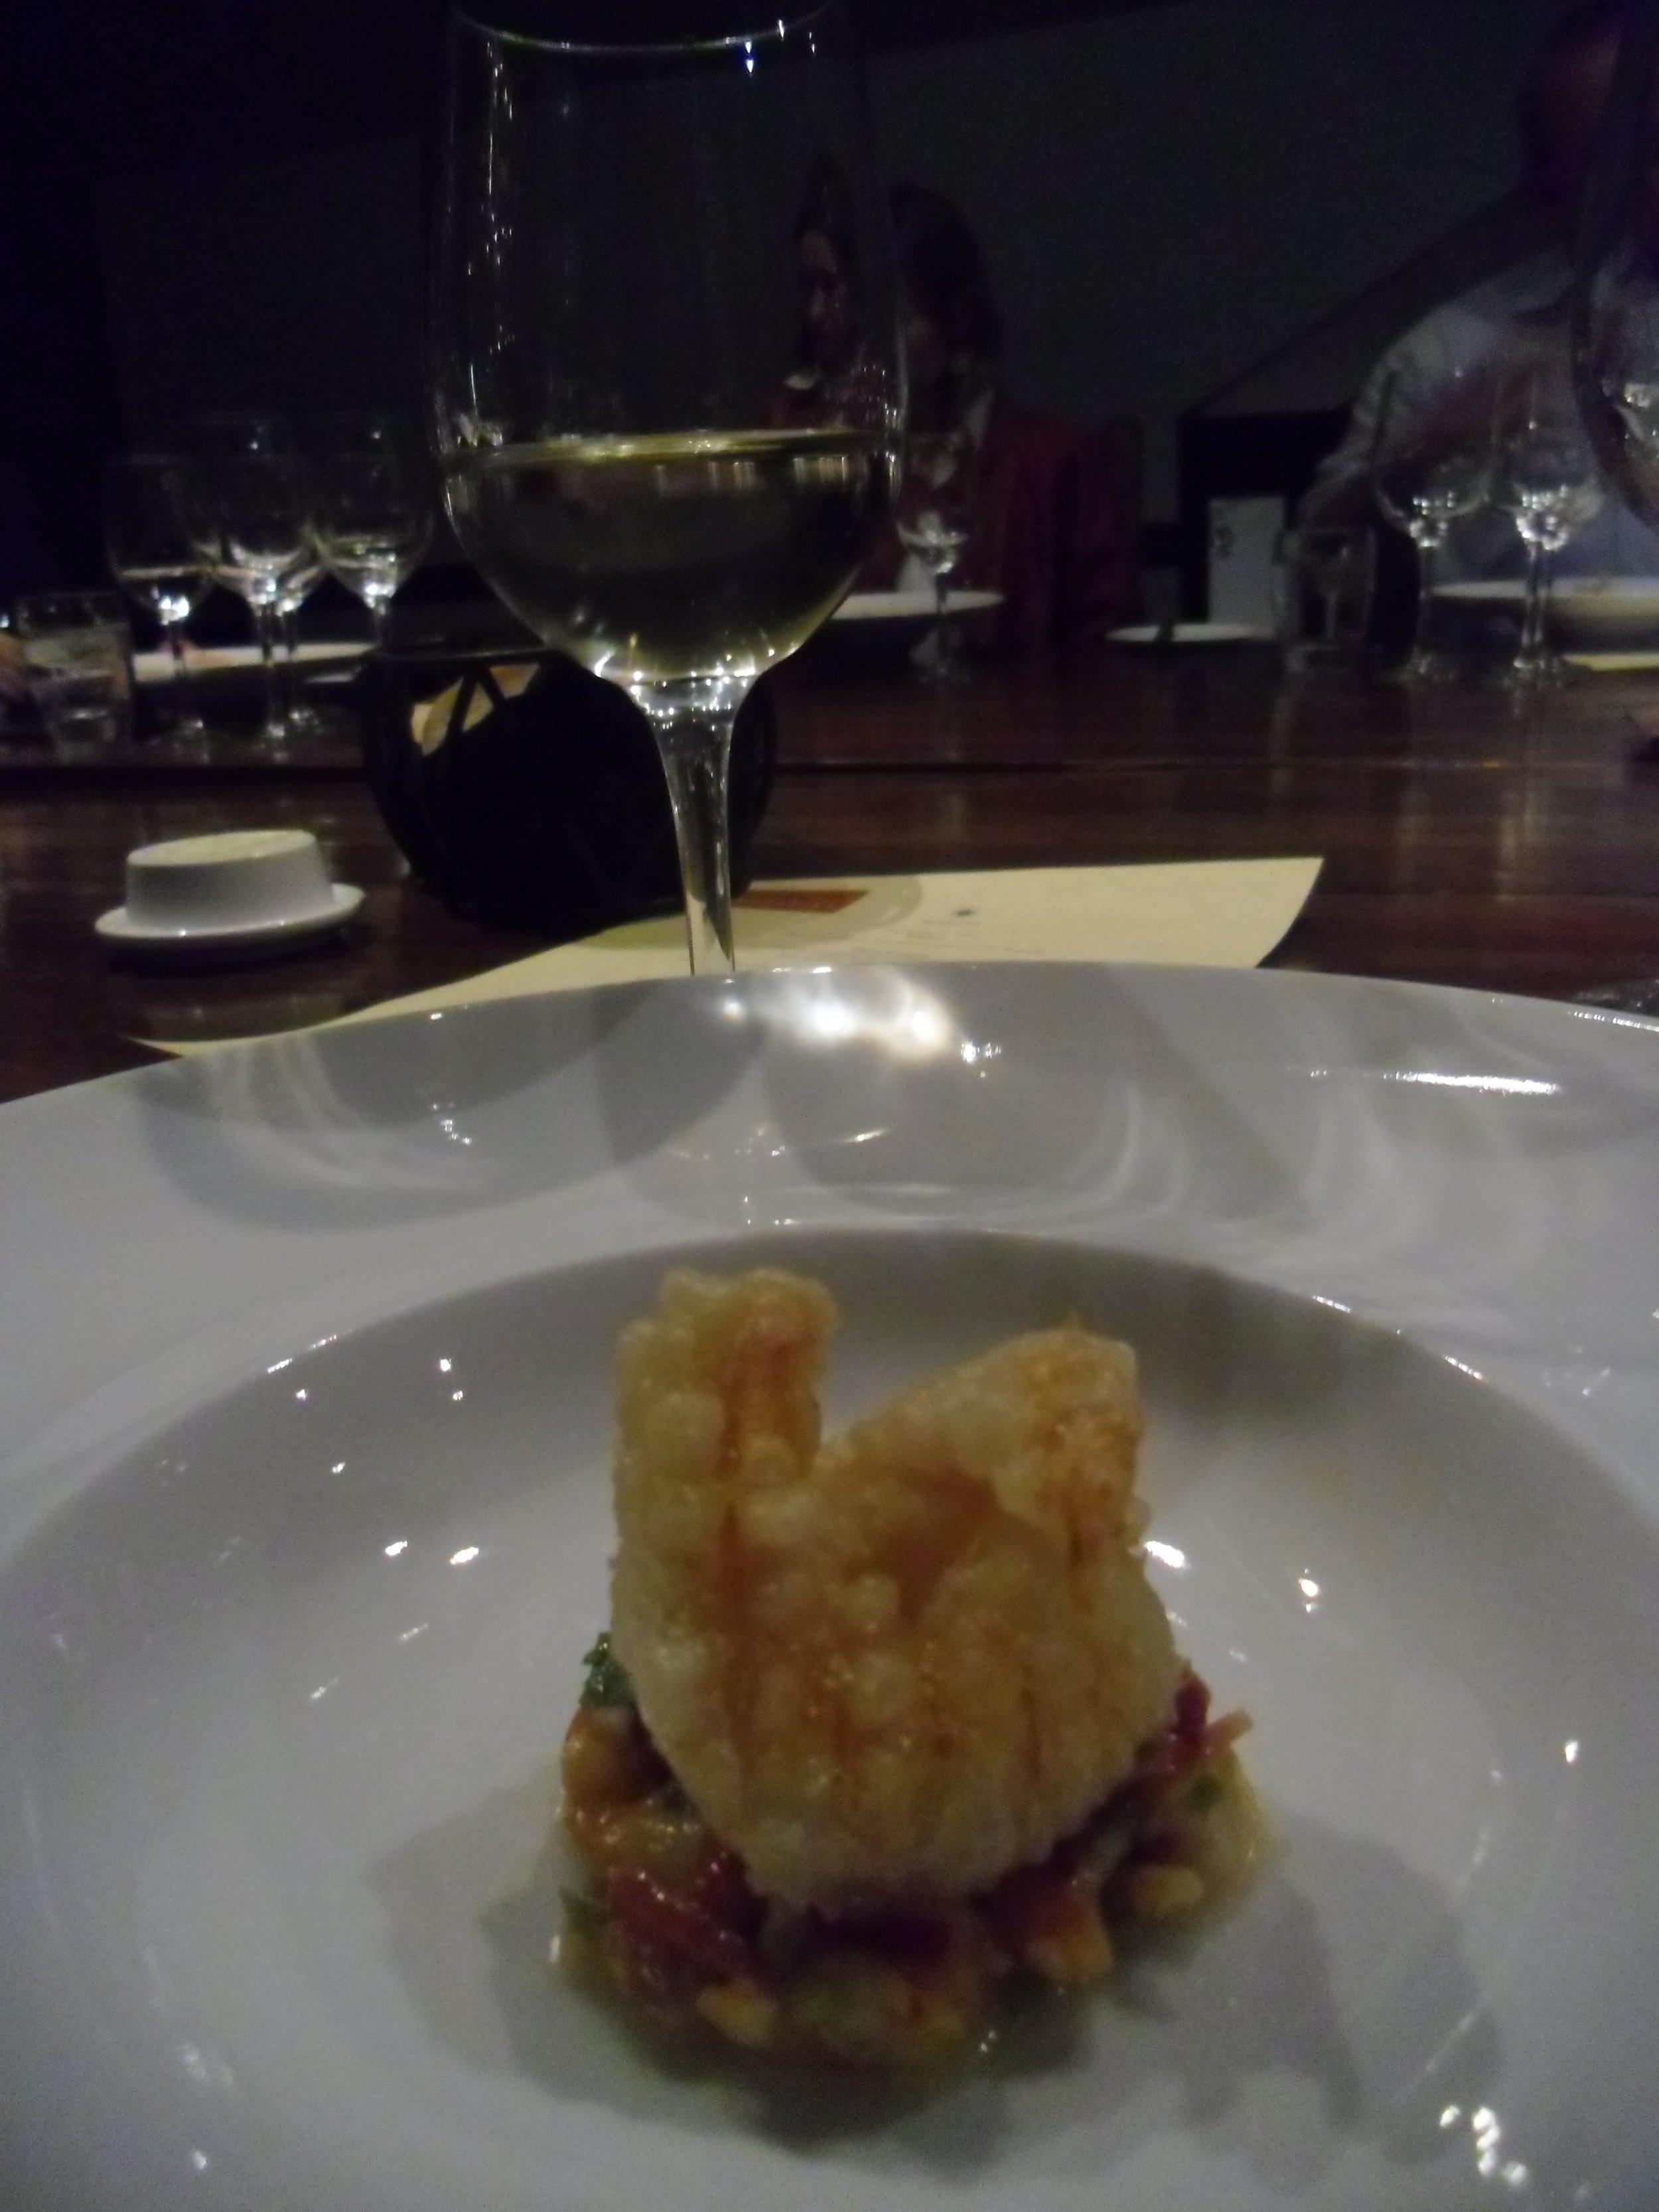 mirassou-wine-dinner-atlanta-wine-tasting1.jpg